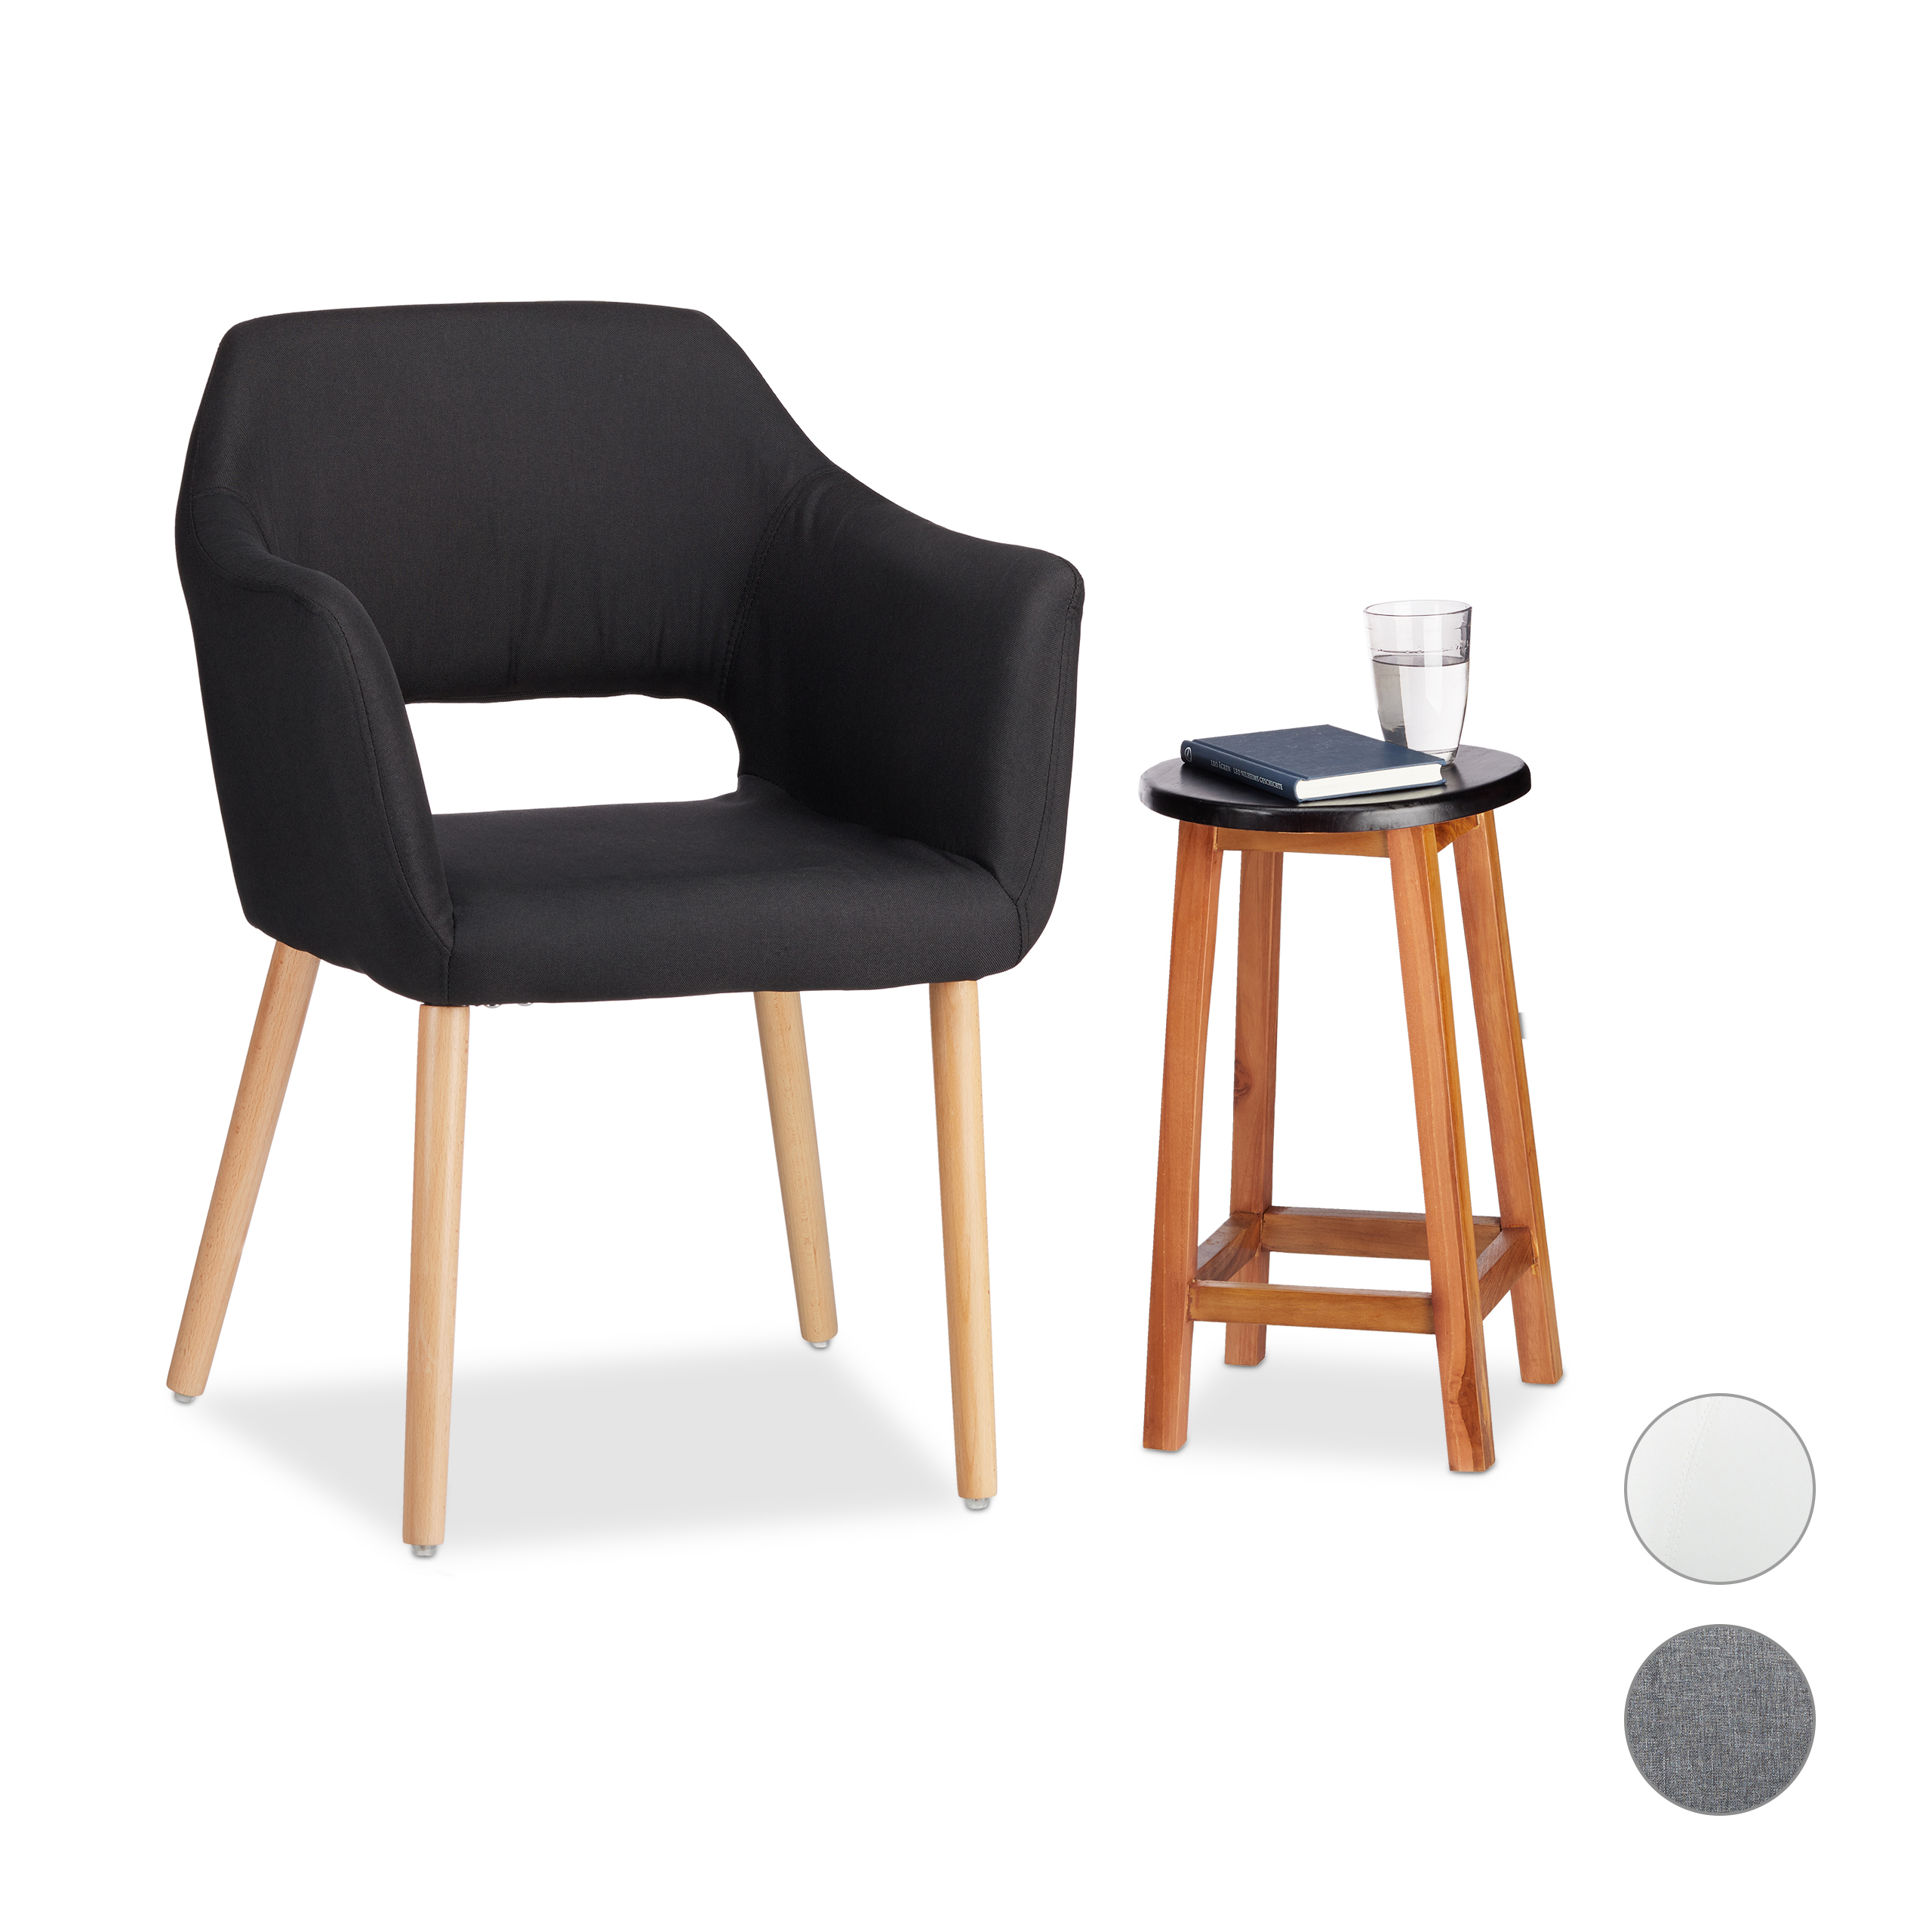 polstersessel design sessel fernsehsessel clubsessel tv sessel relaxsessel ebay. Black Bedroom Furniture Sets. Home Design Ideas